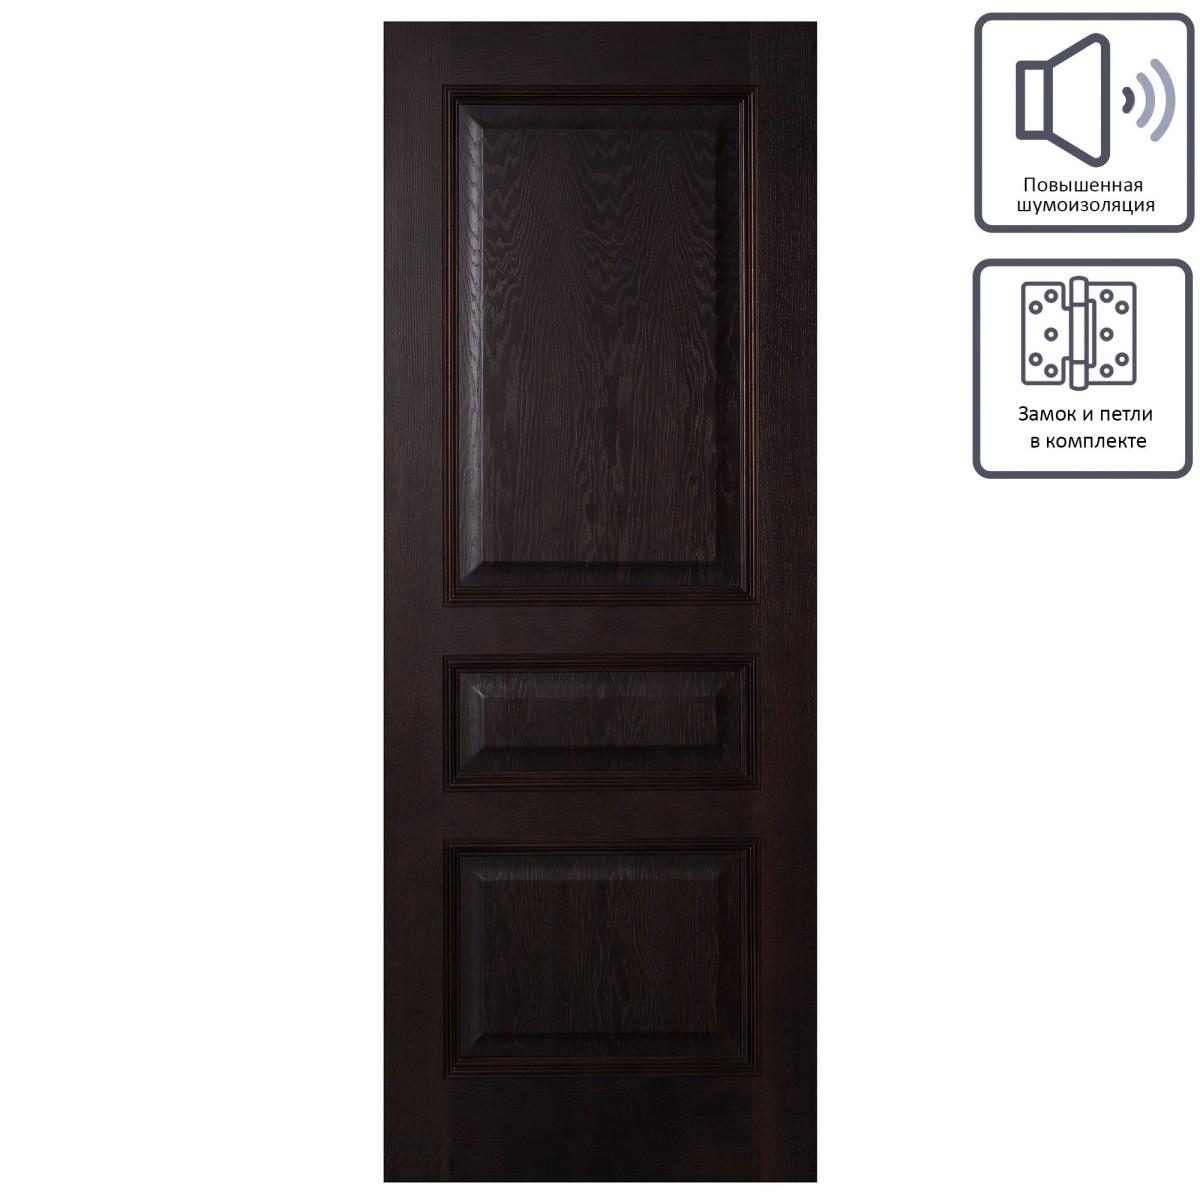 Дверь Межкомнатная Глухая Шпон Вельми 60x200 Цвет Венге